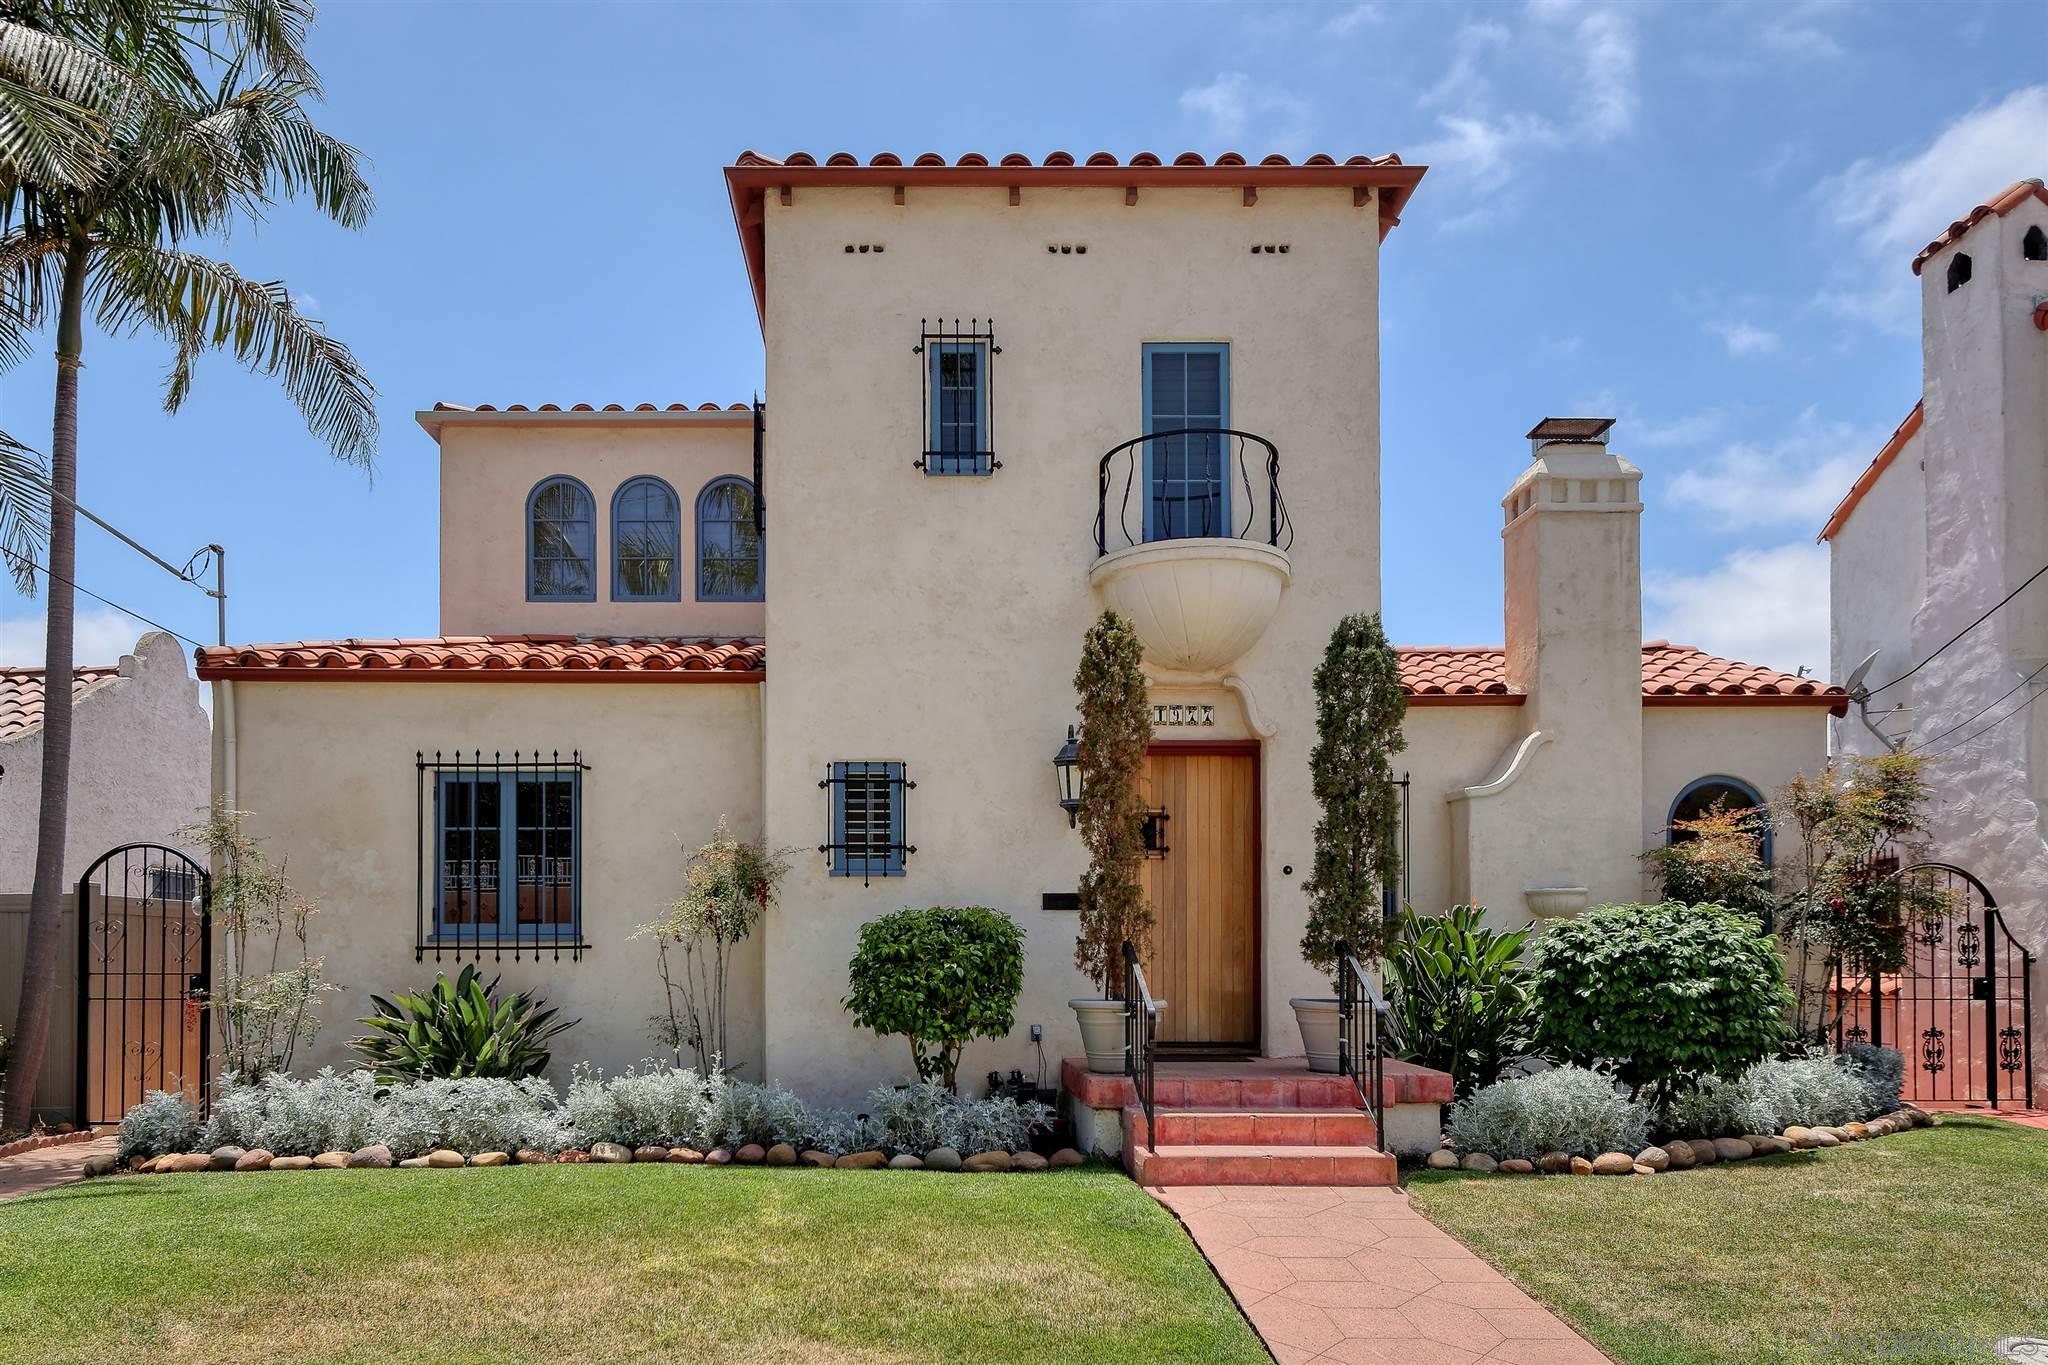 1977 Titus Street, San Diego, CA 92103